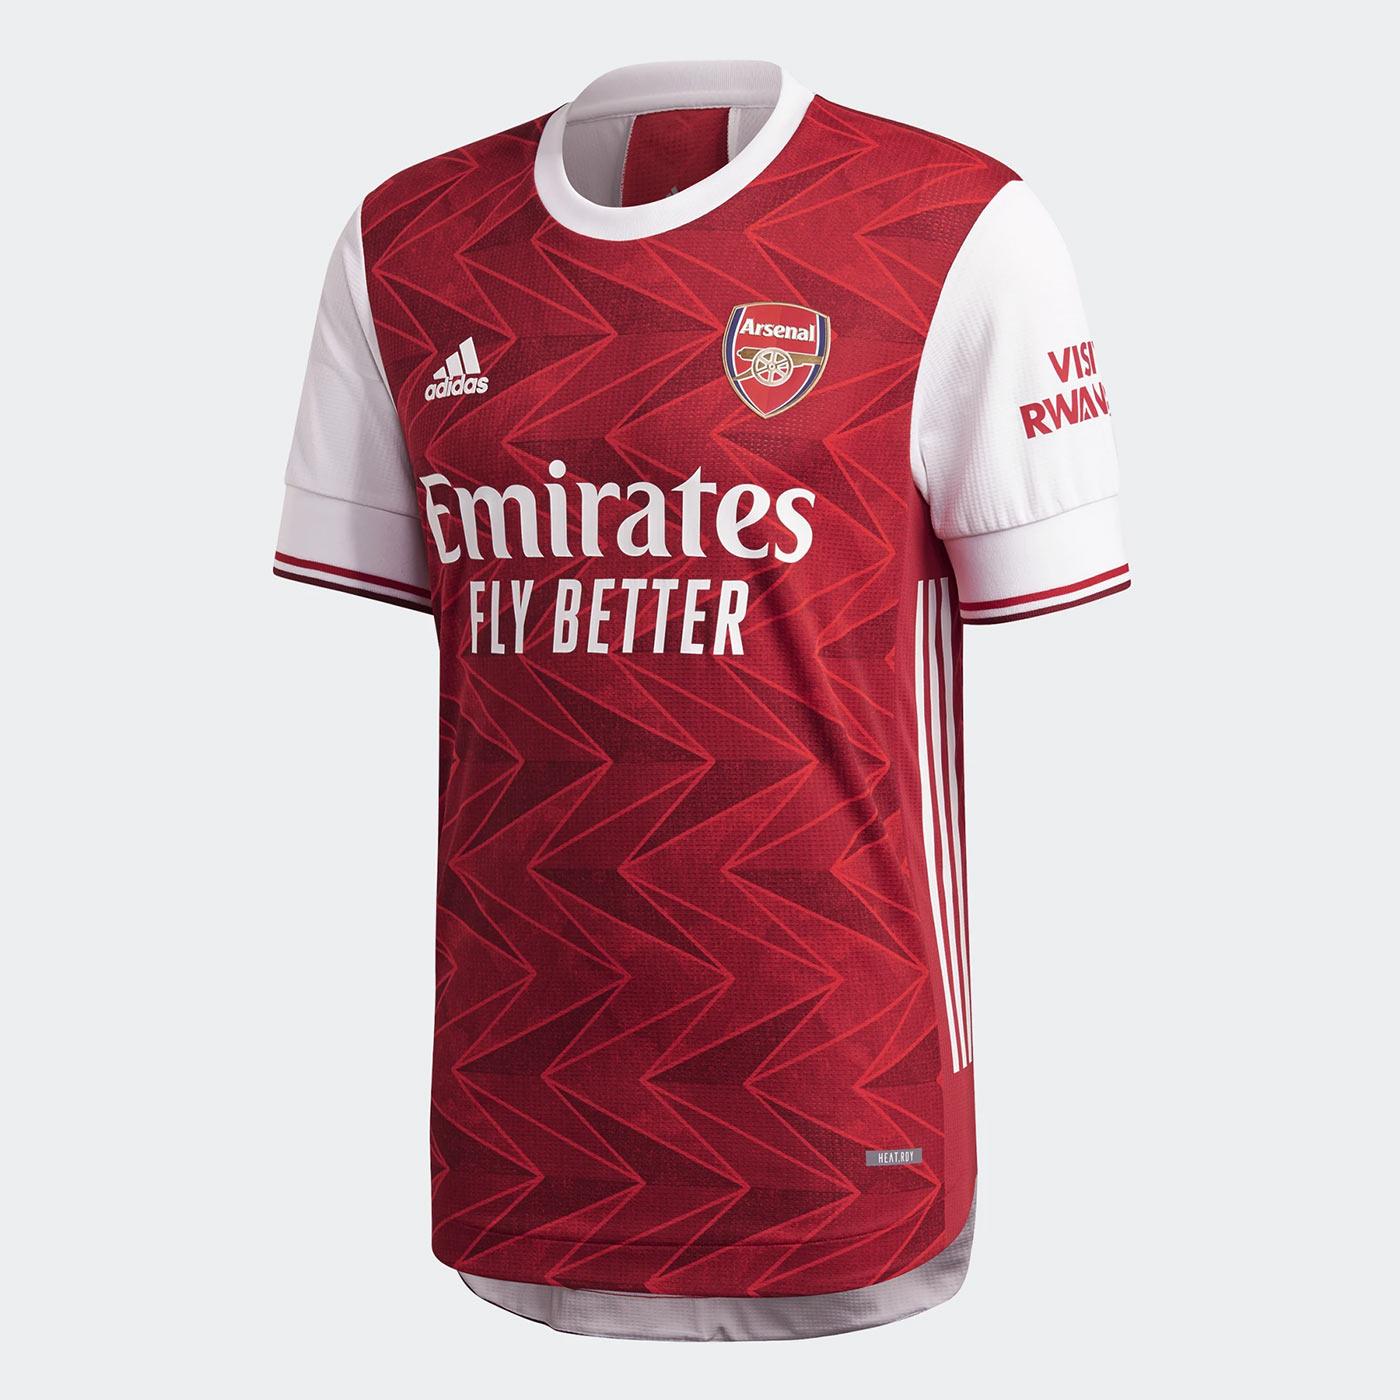 Maglia Arsenal 2020-2021, Adidas rispolvera un motivo Art Decò